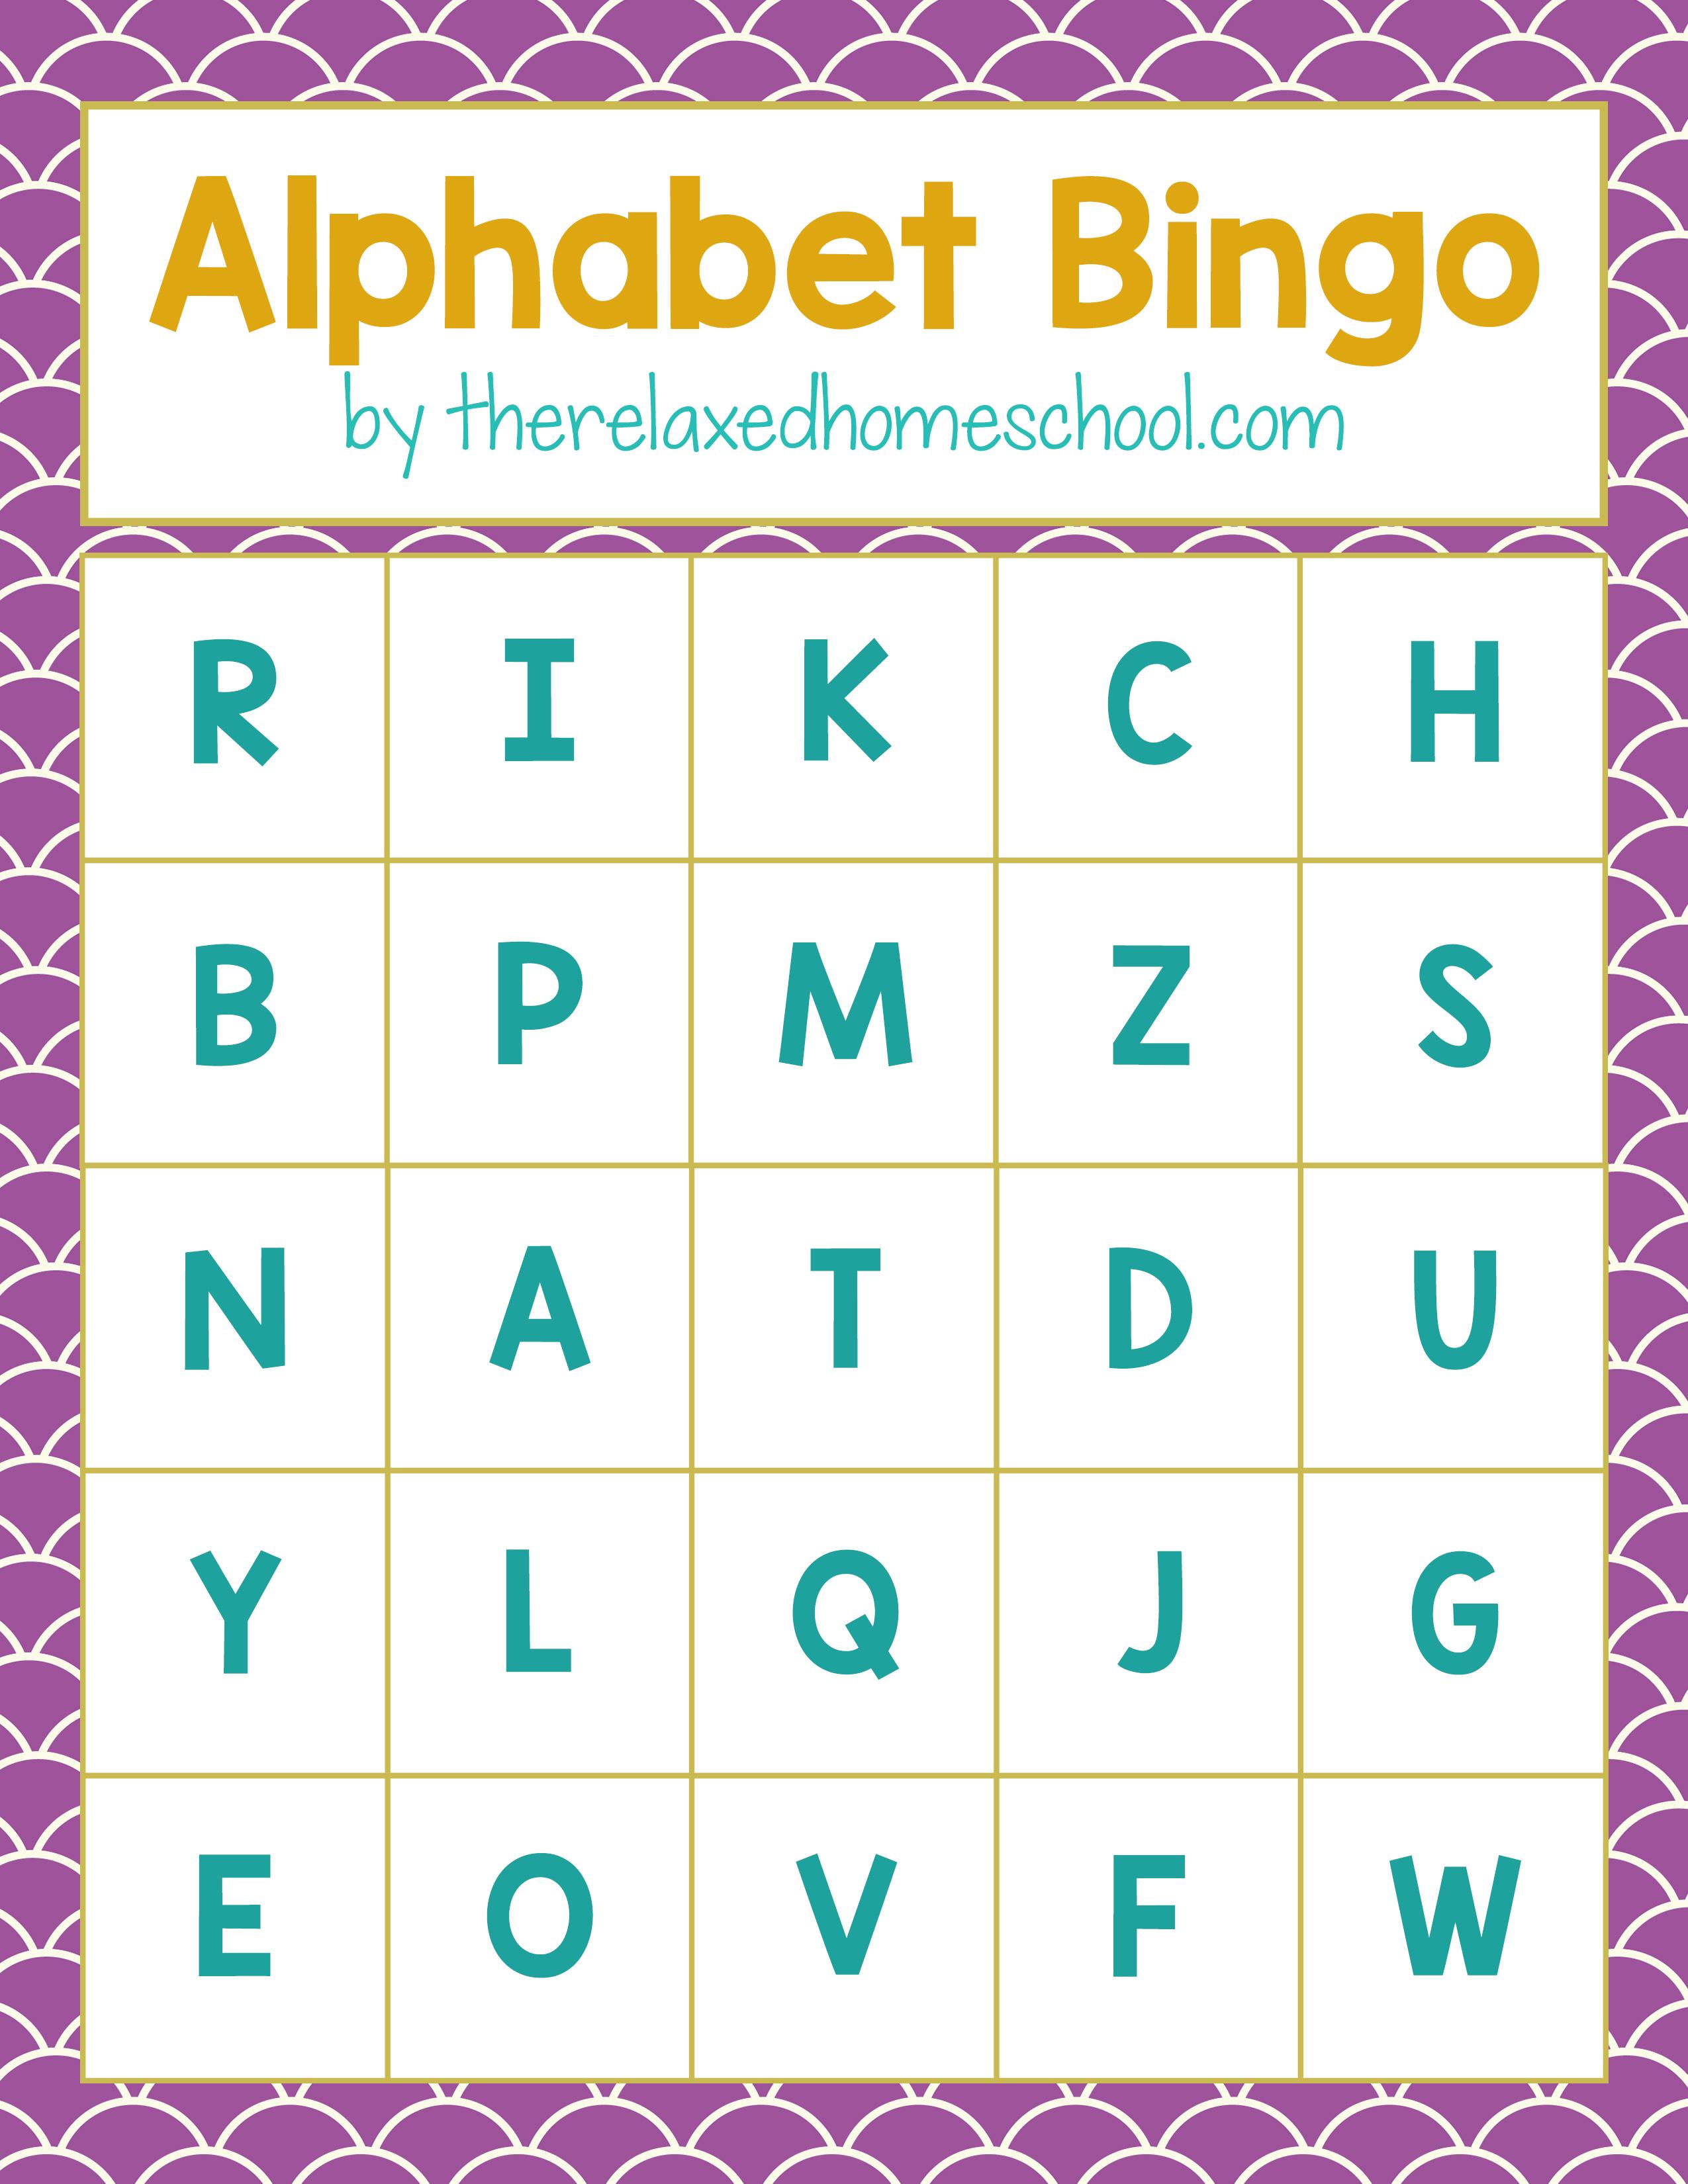 Free Printable Alphabet Letters Bingo Game